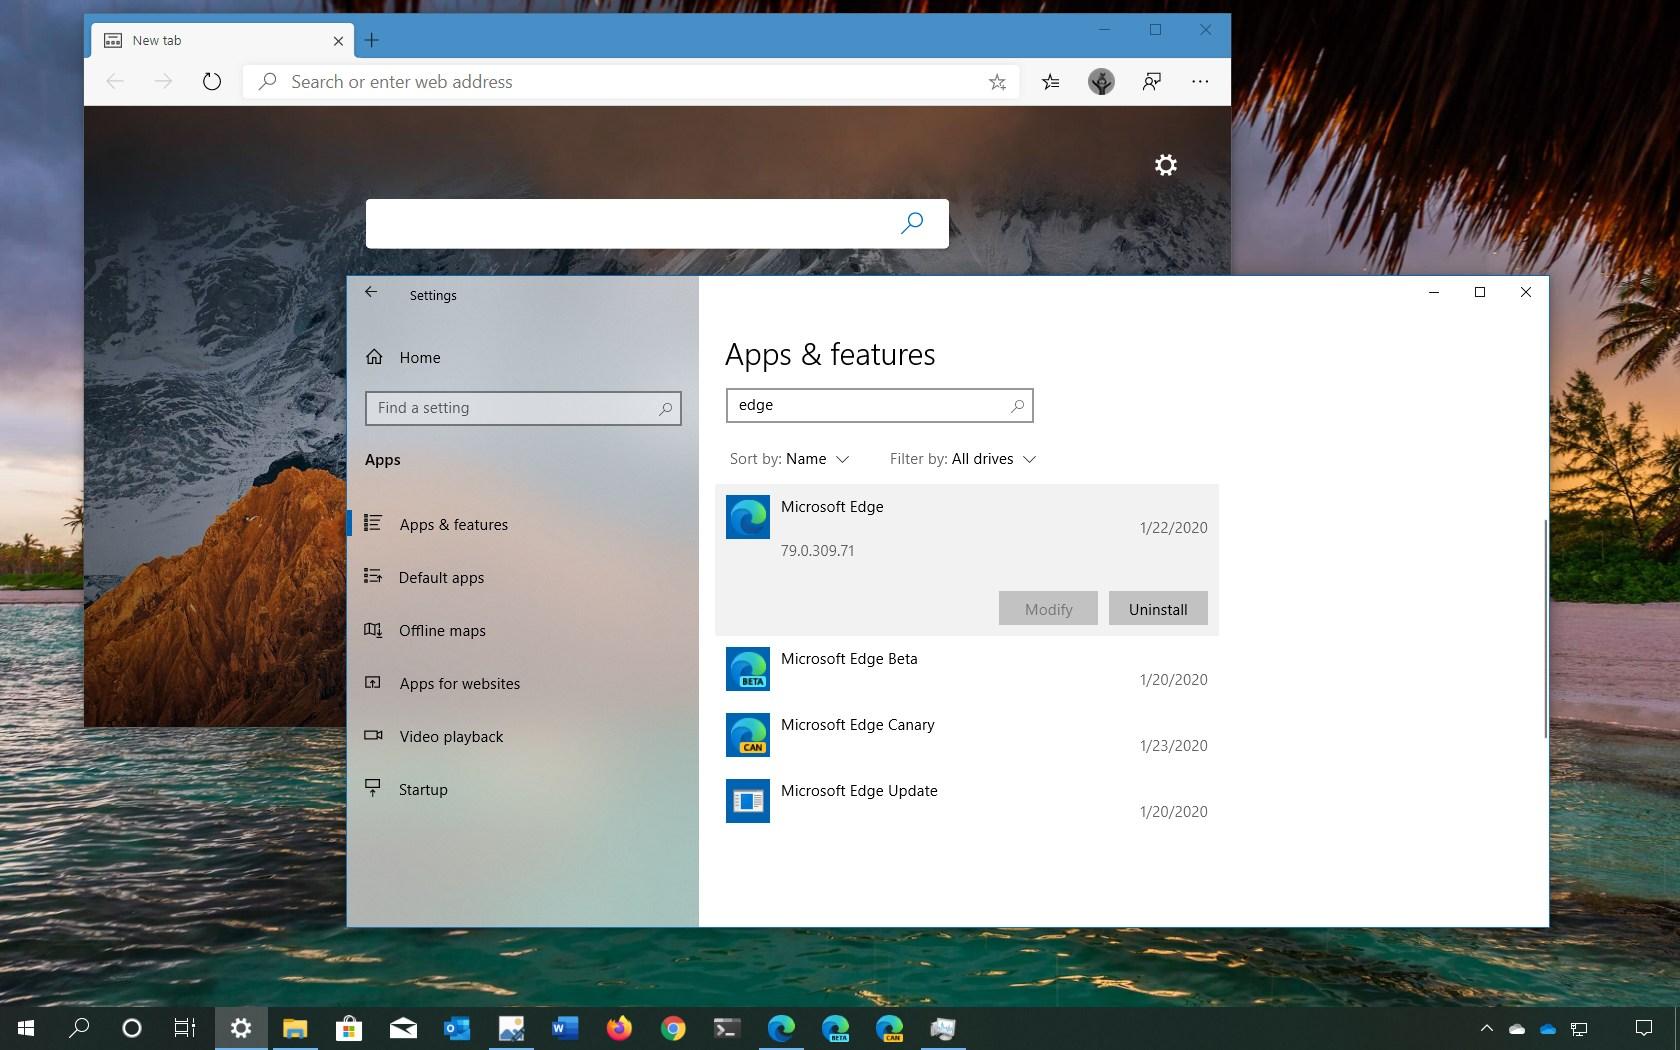 Microsoft Edge Chromium uninstall option